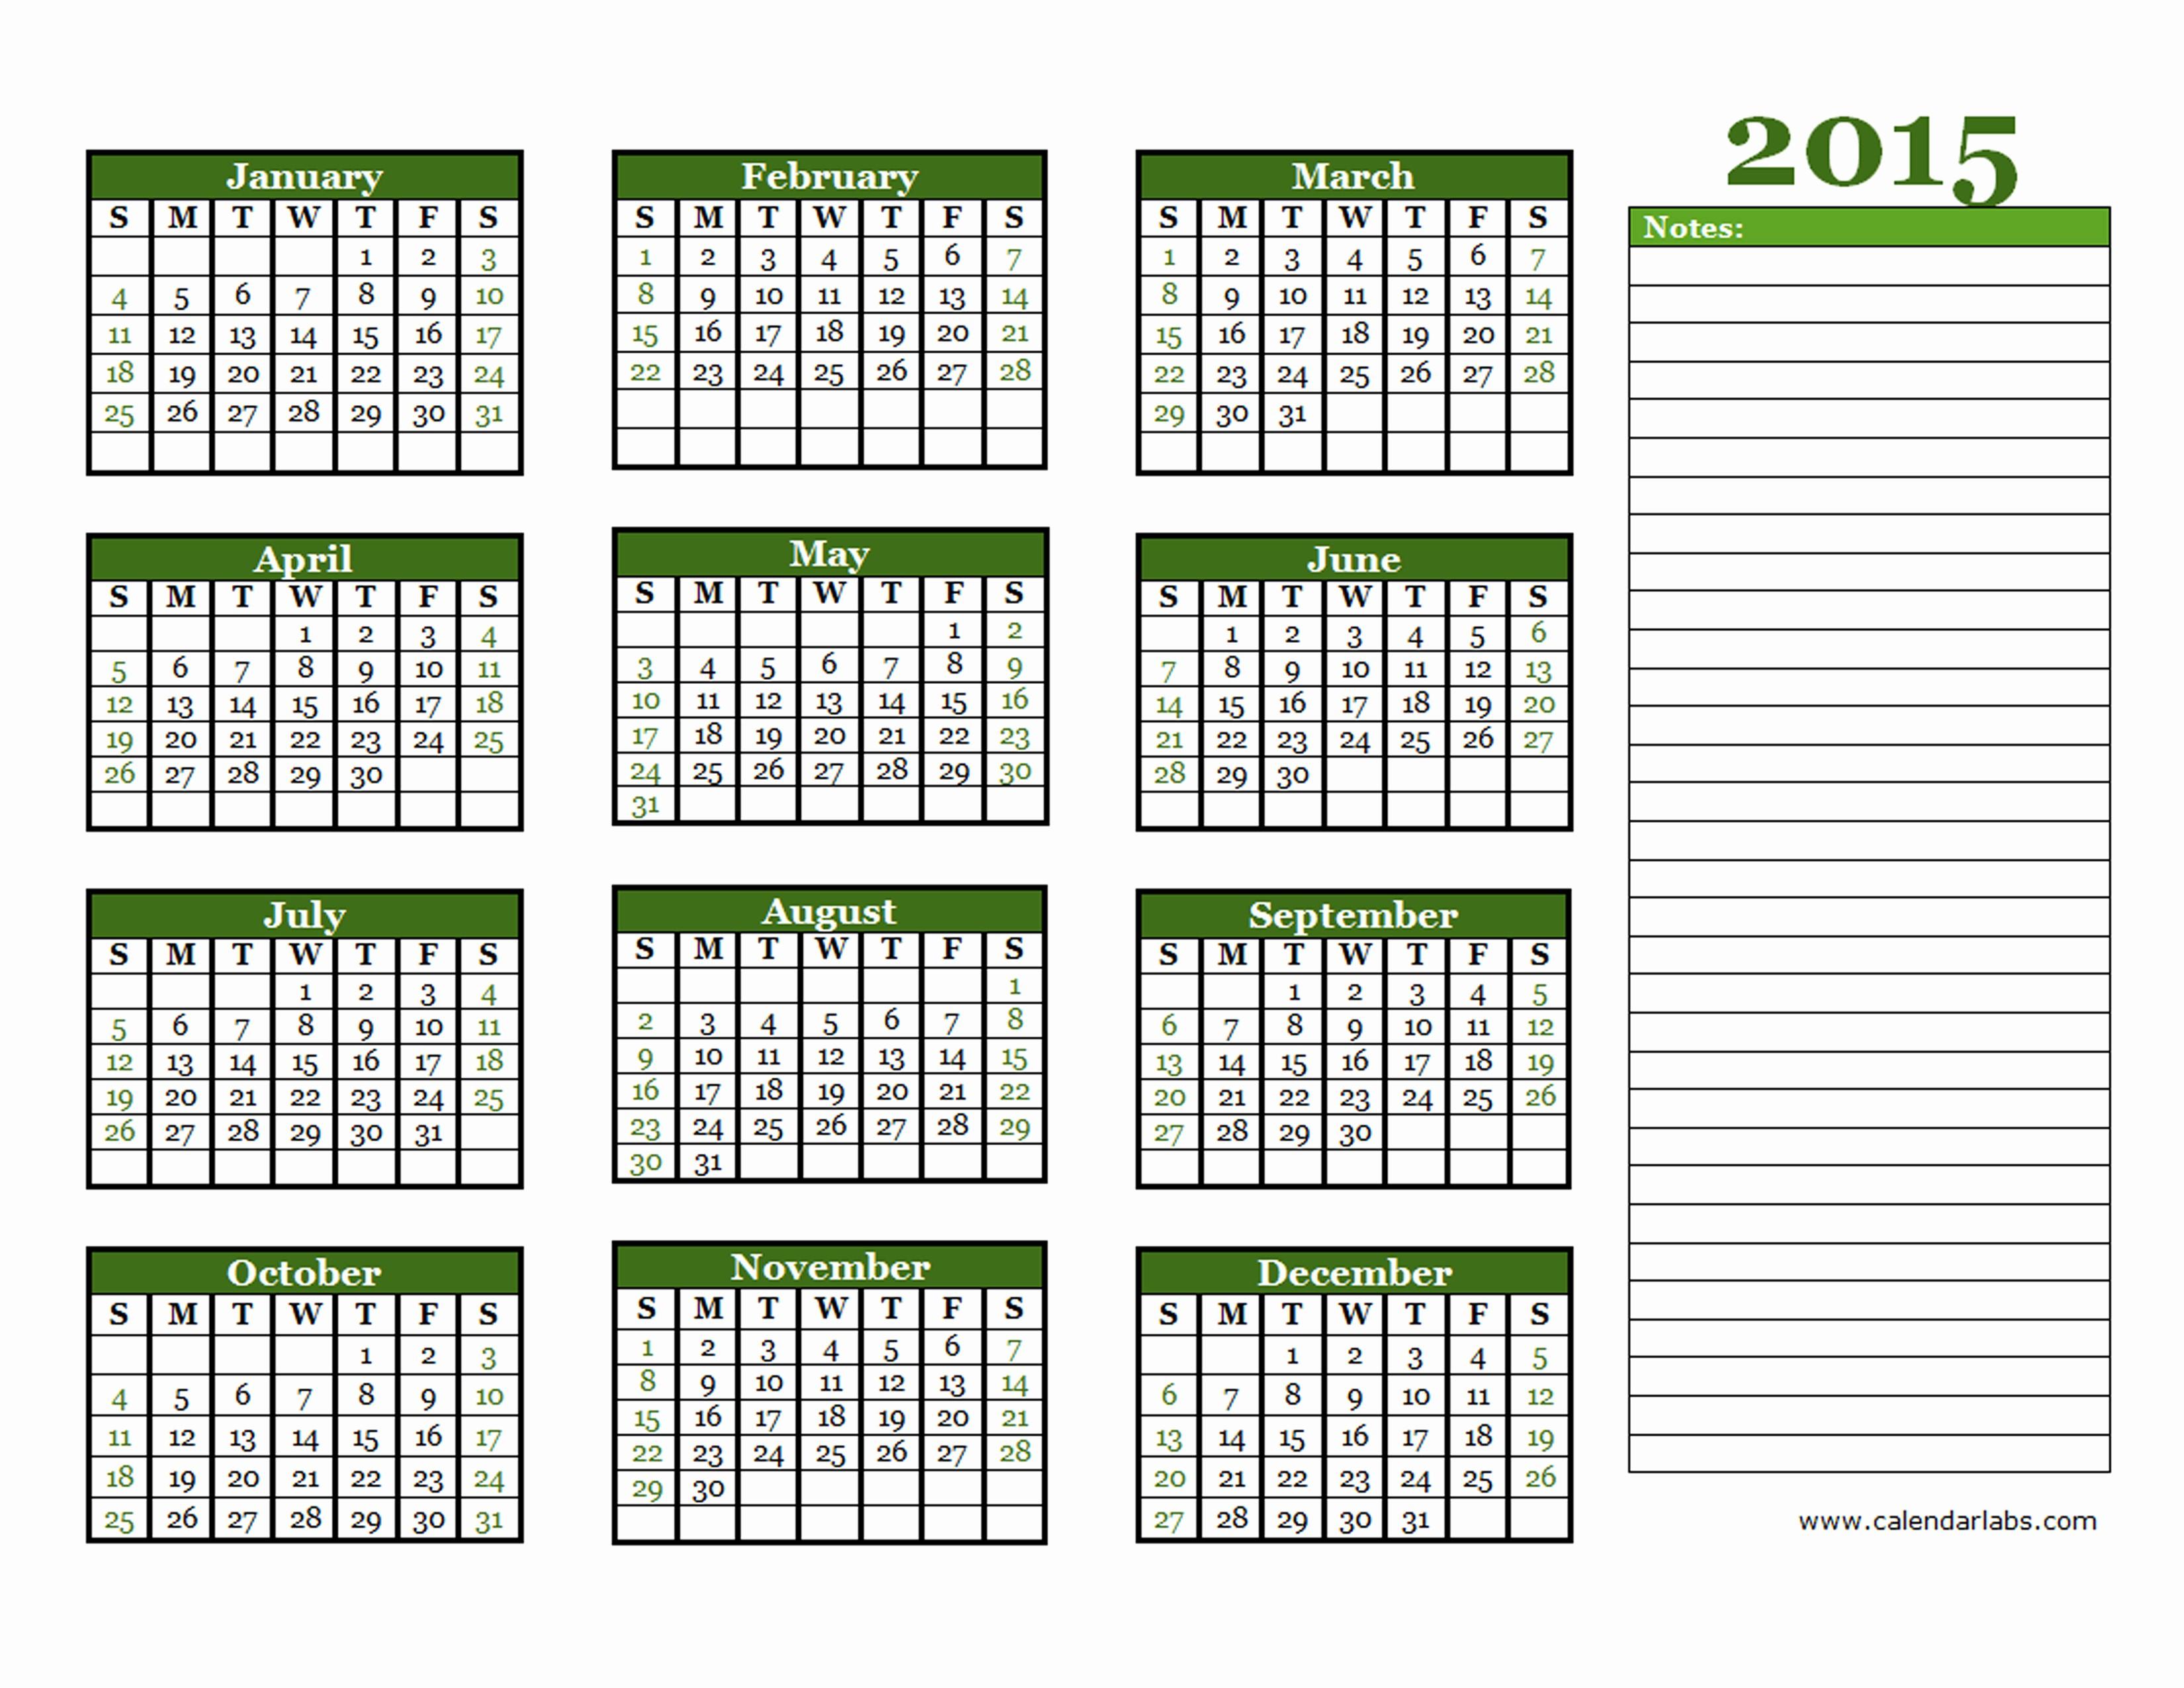 2015 Yearly Calendar Printable Landscape Fresh 2015 Yearly Calendar Free Printable Templates